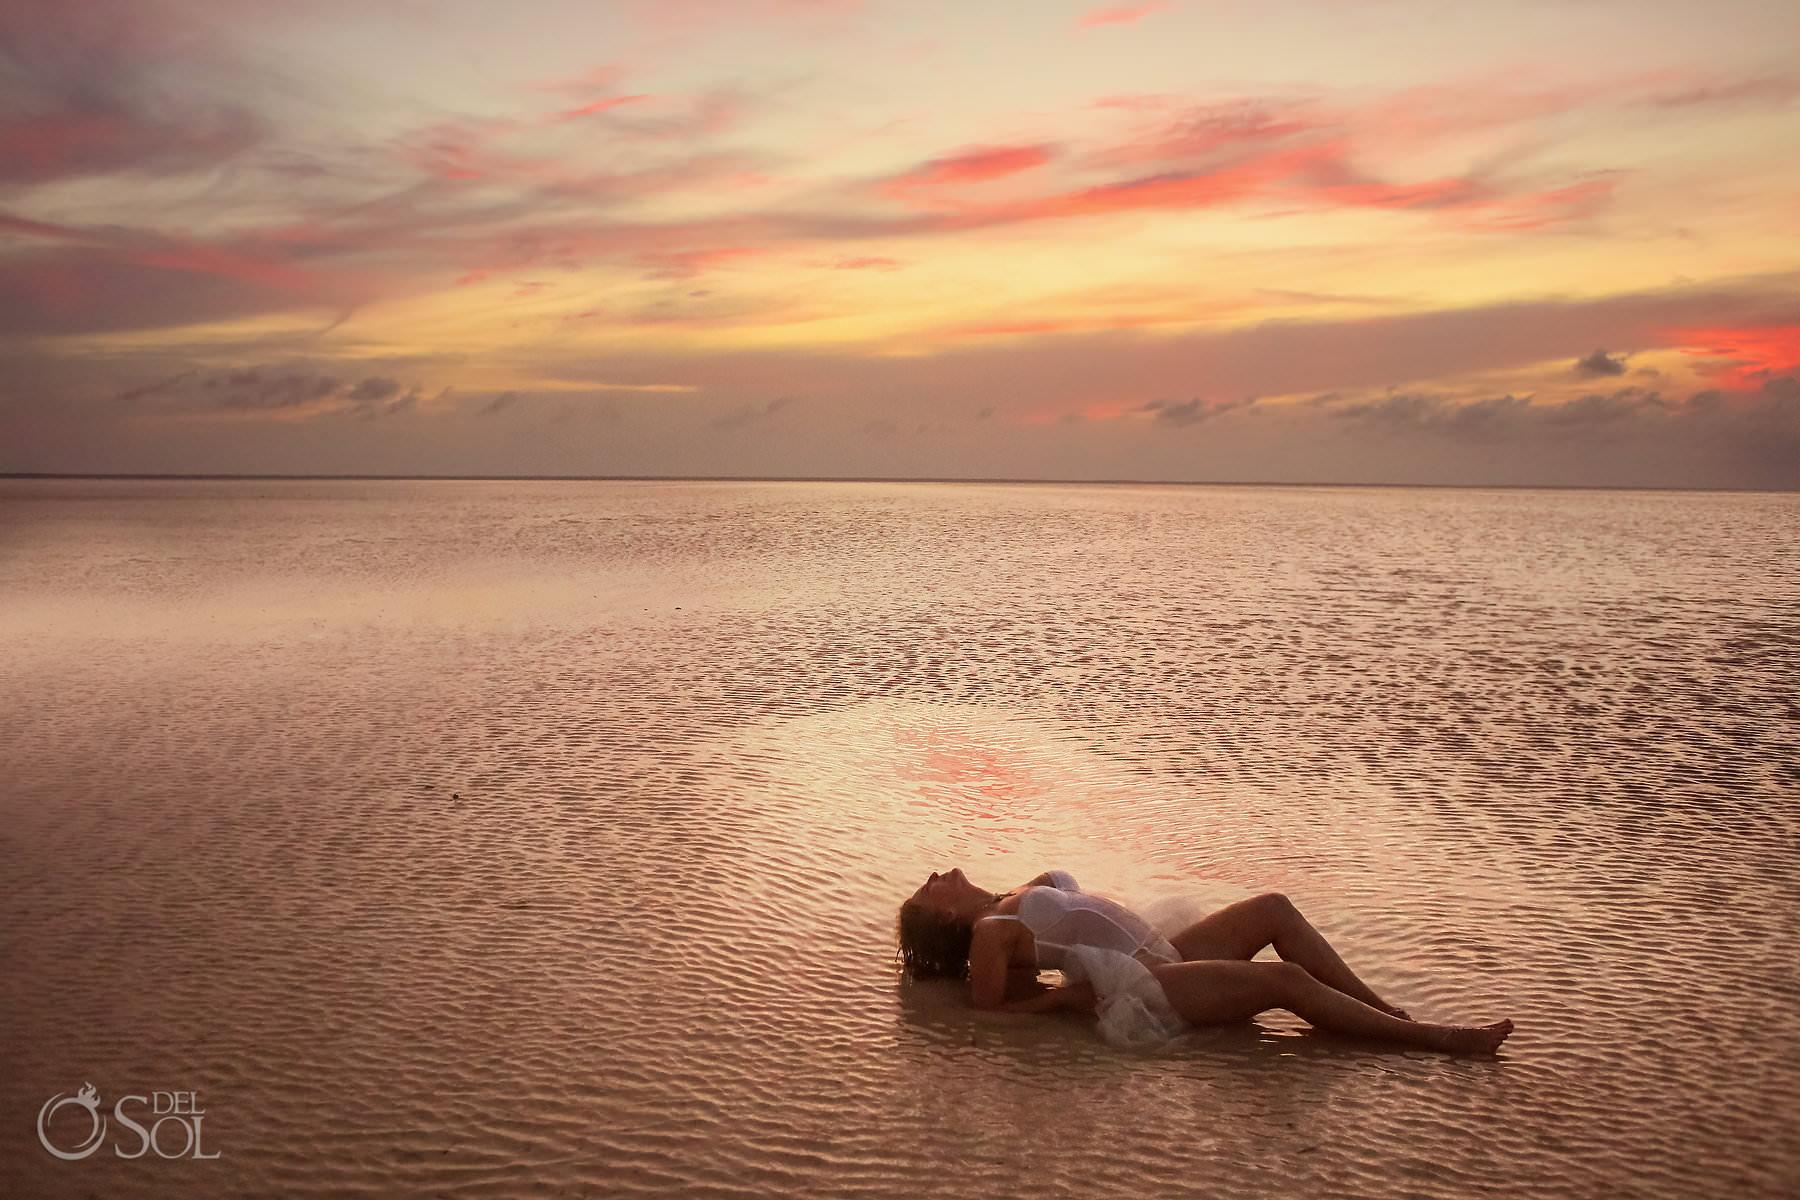 Sunset boudoir photo session dreams playa mujeres